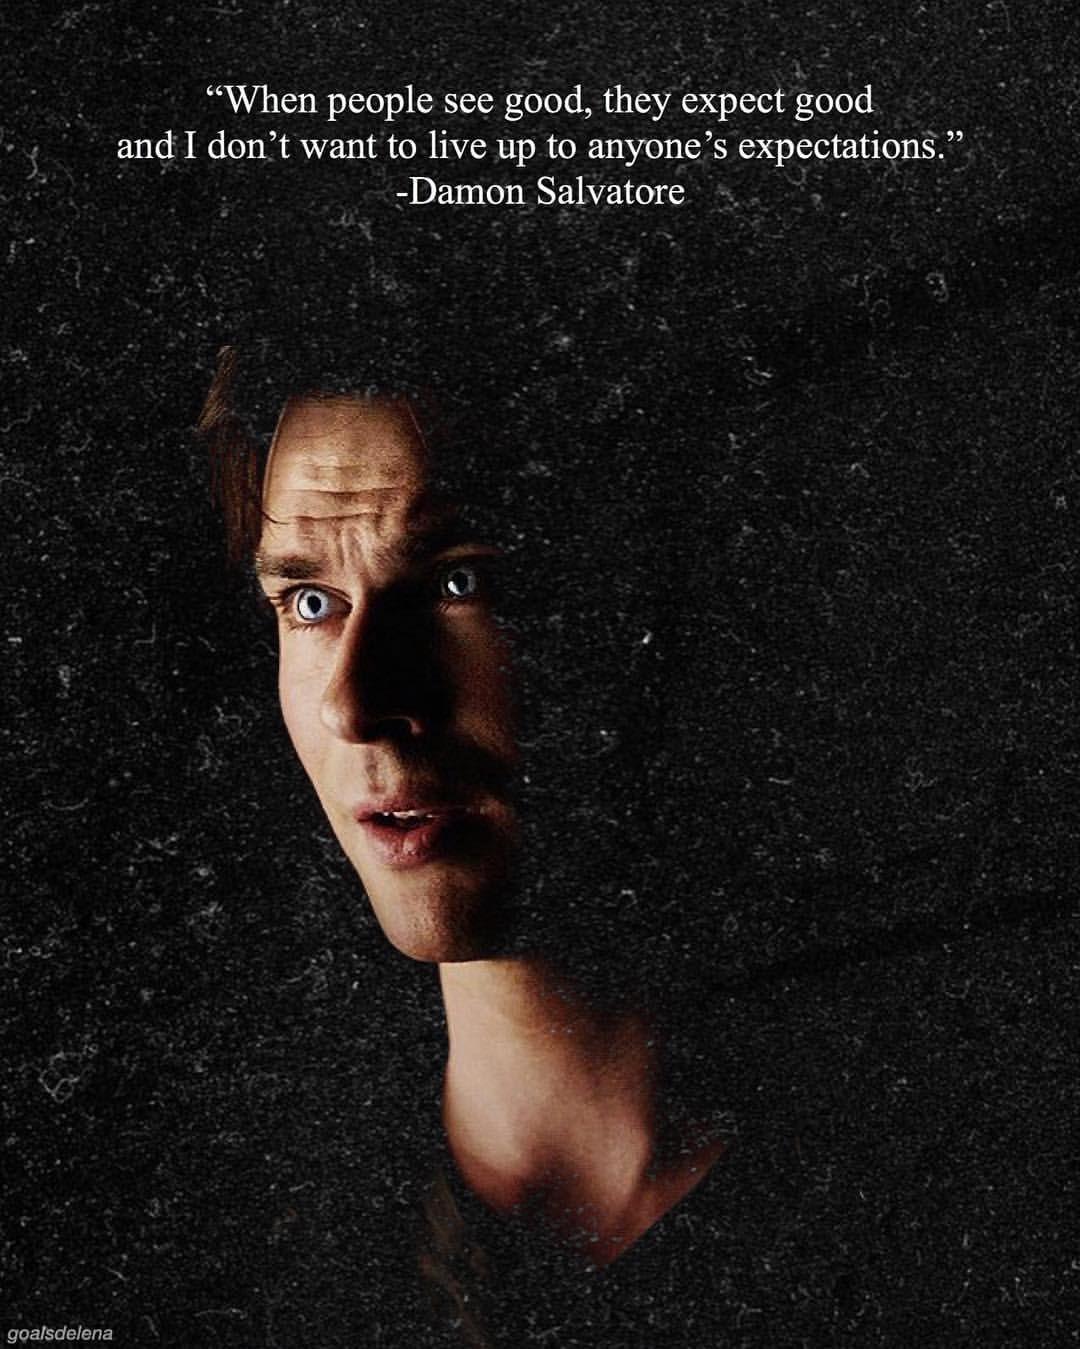 The Vampire Diaries Delena Damon Salvatore Fond D Ecran Vampire Diaries Damon Salvatore Vampires